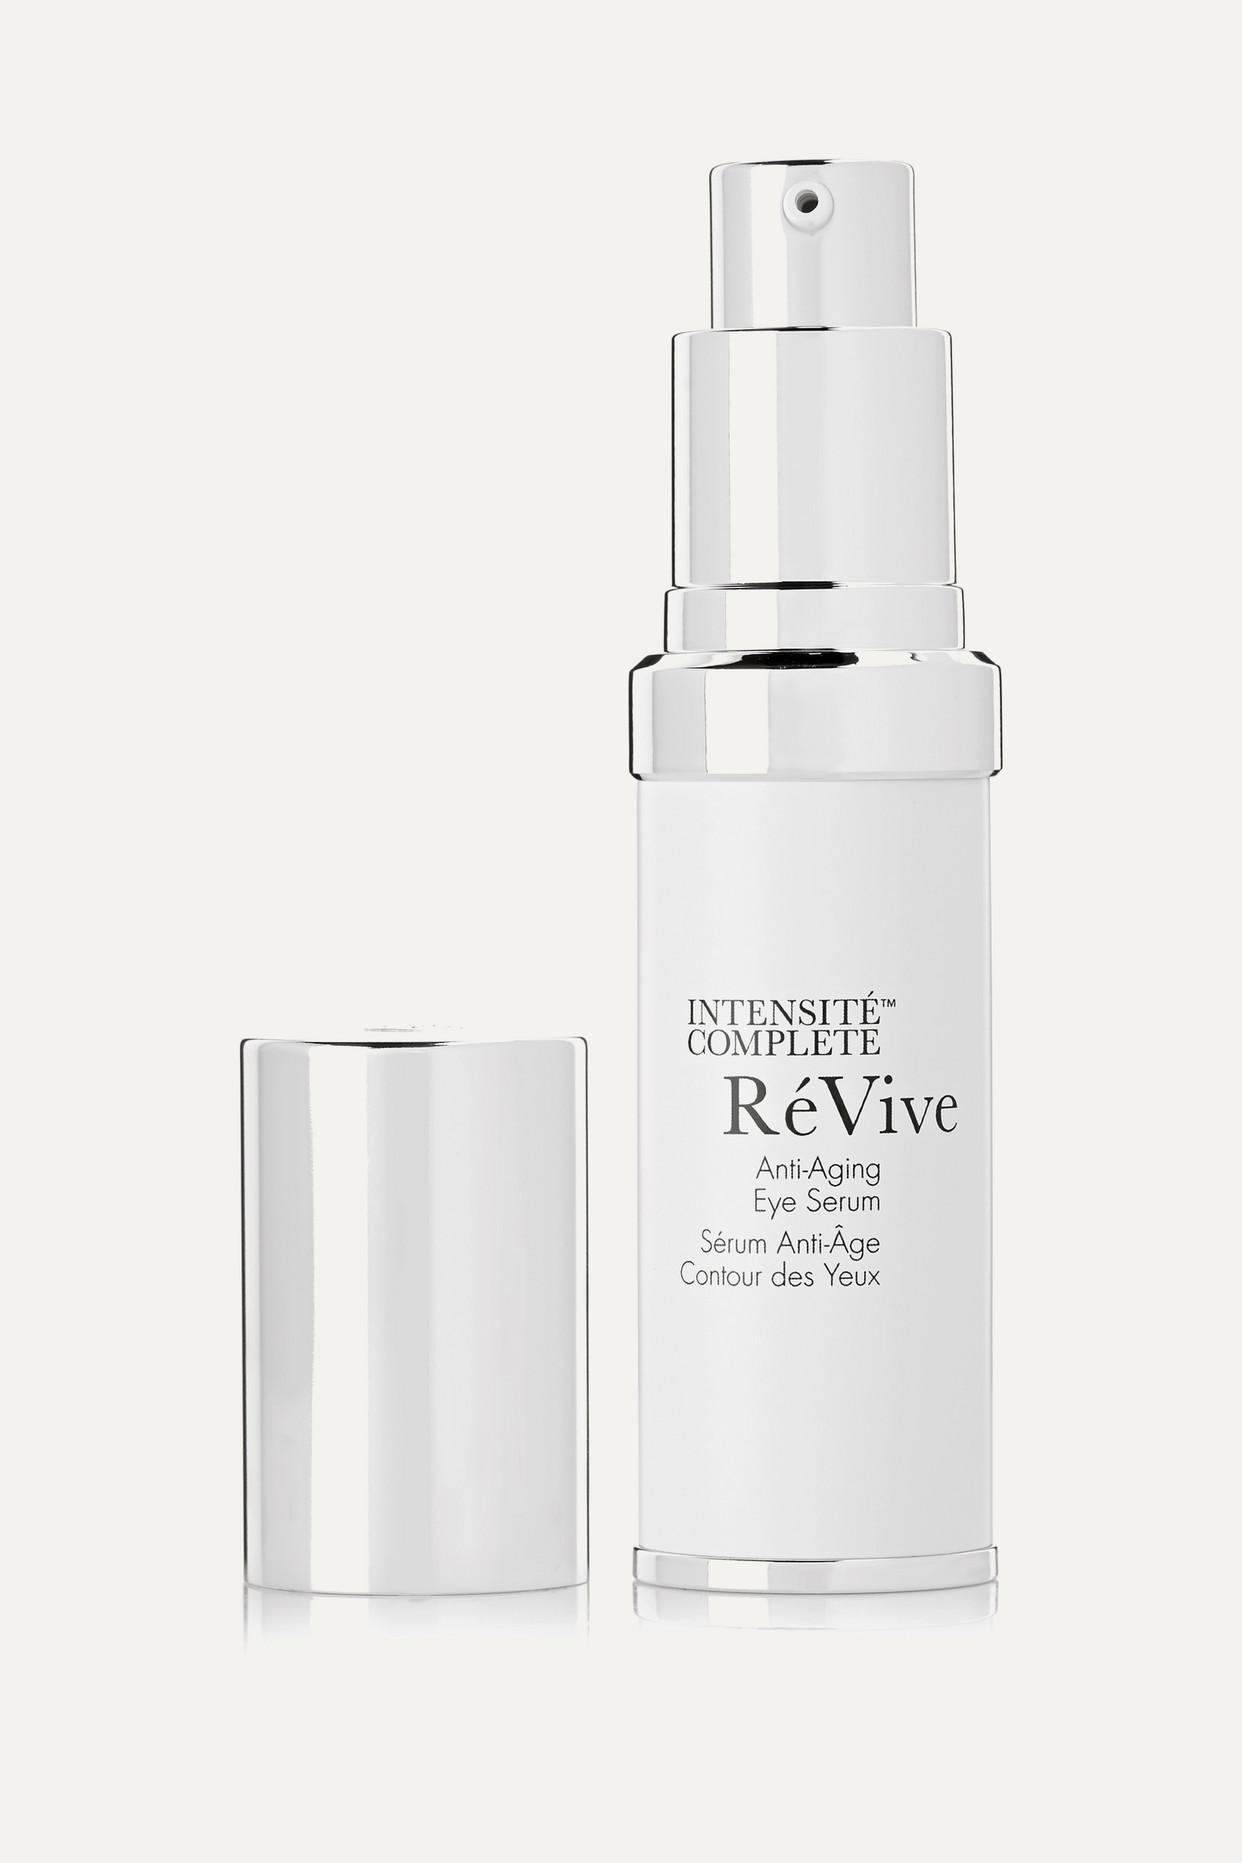 RÉVIVE - Intensité Complete Anti-aging Eye Serum, 15ml - one size